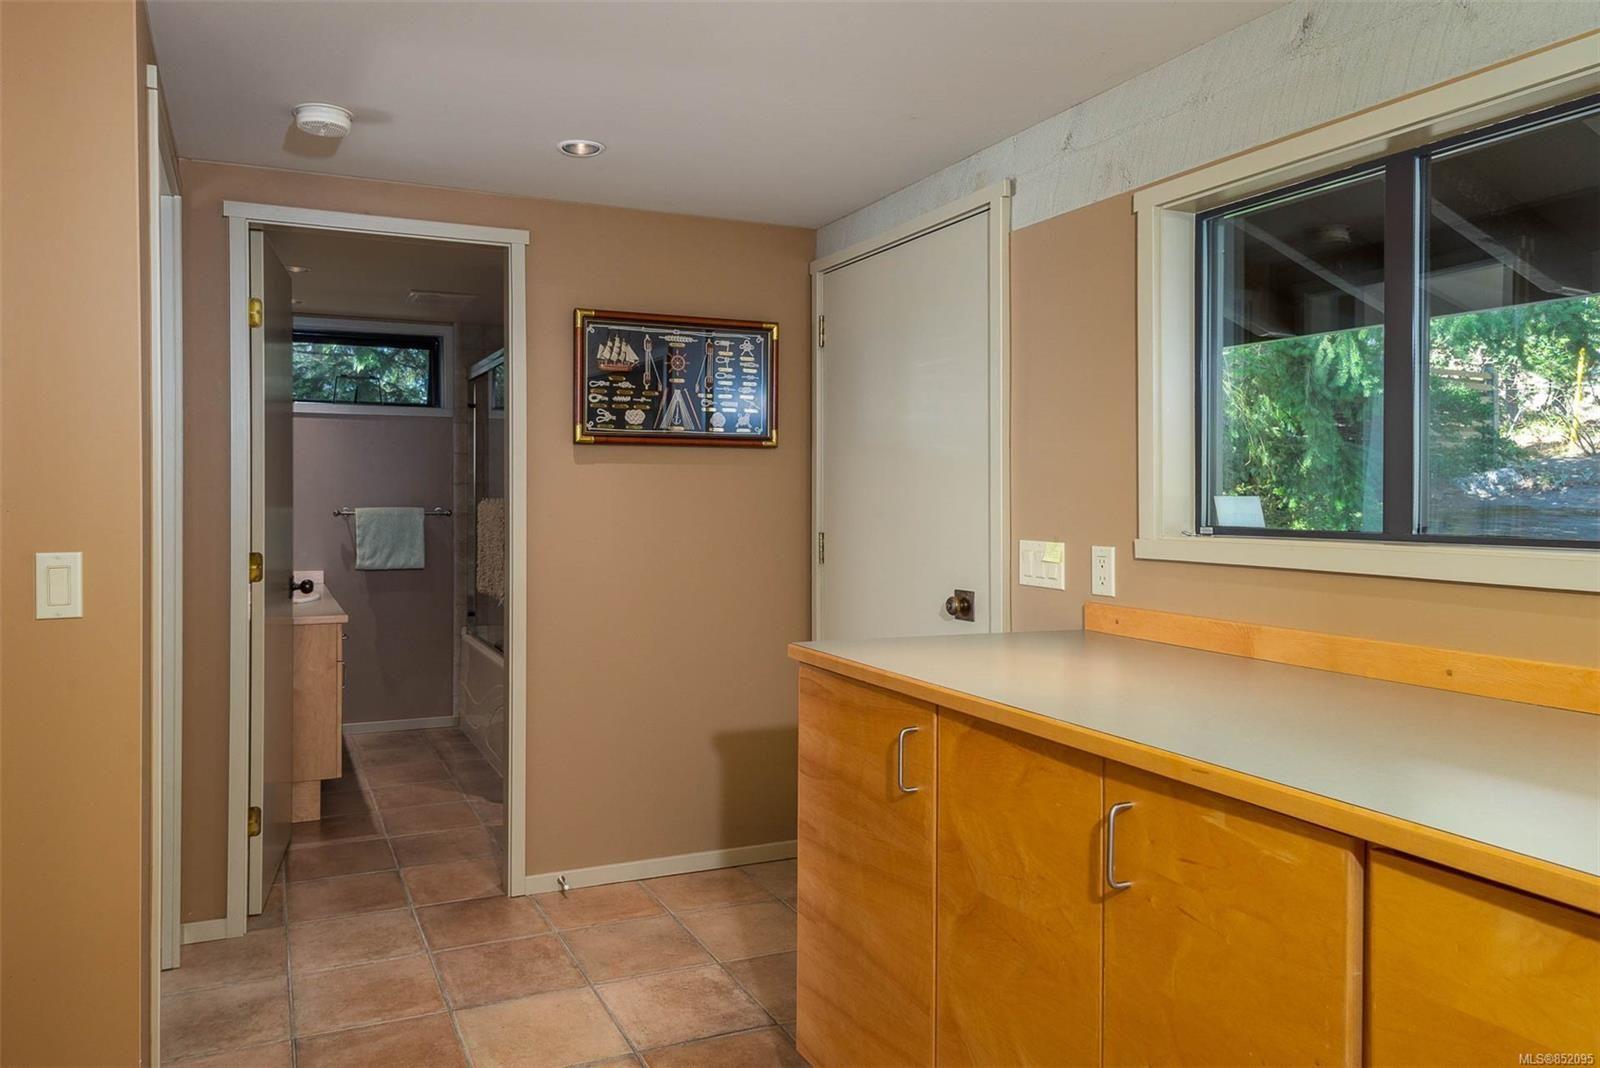 Photo 25: Photos: 236 McGill Rd in : GI Salt Spring House for sale (Gulf Islands)  : MLS®# 852095